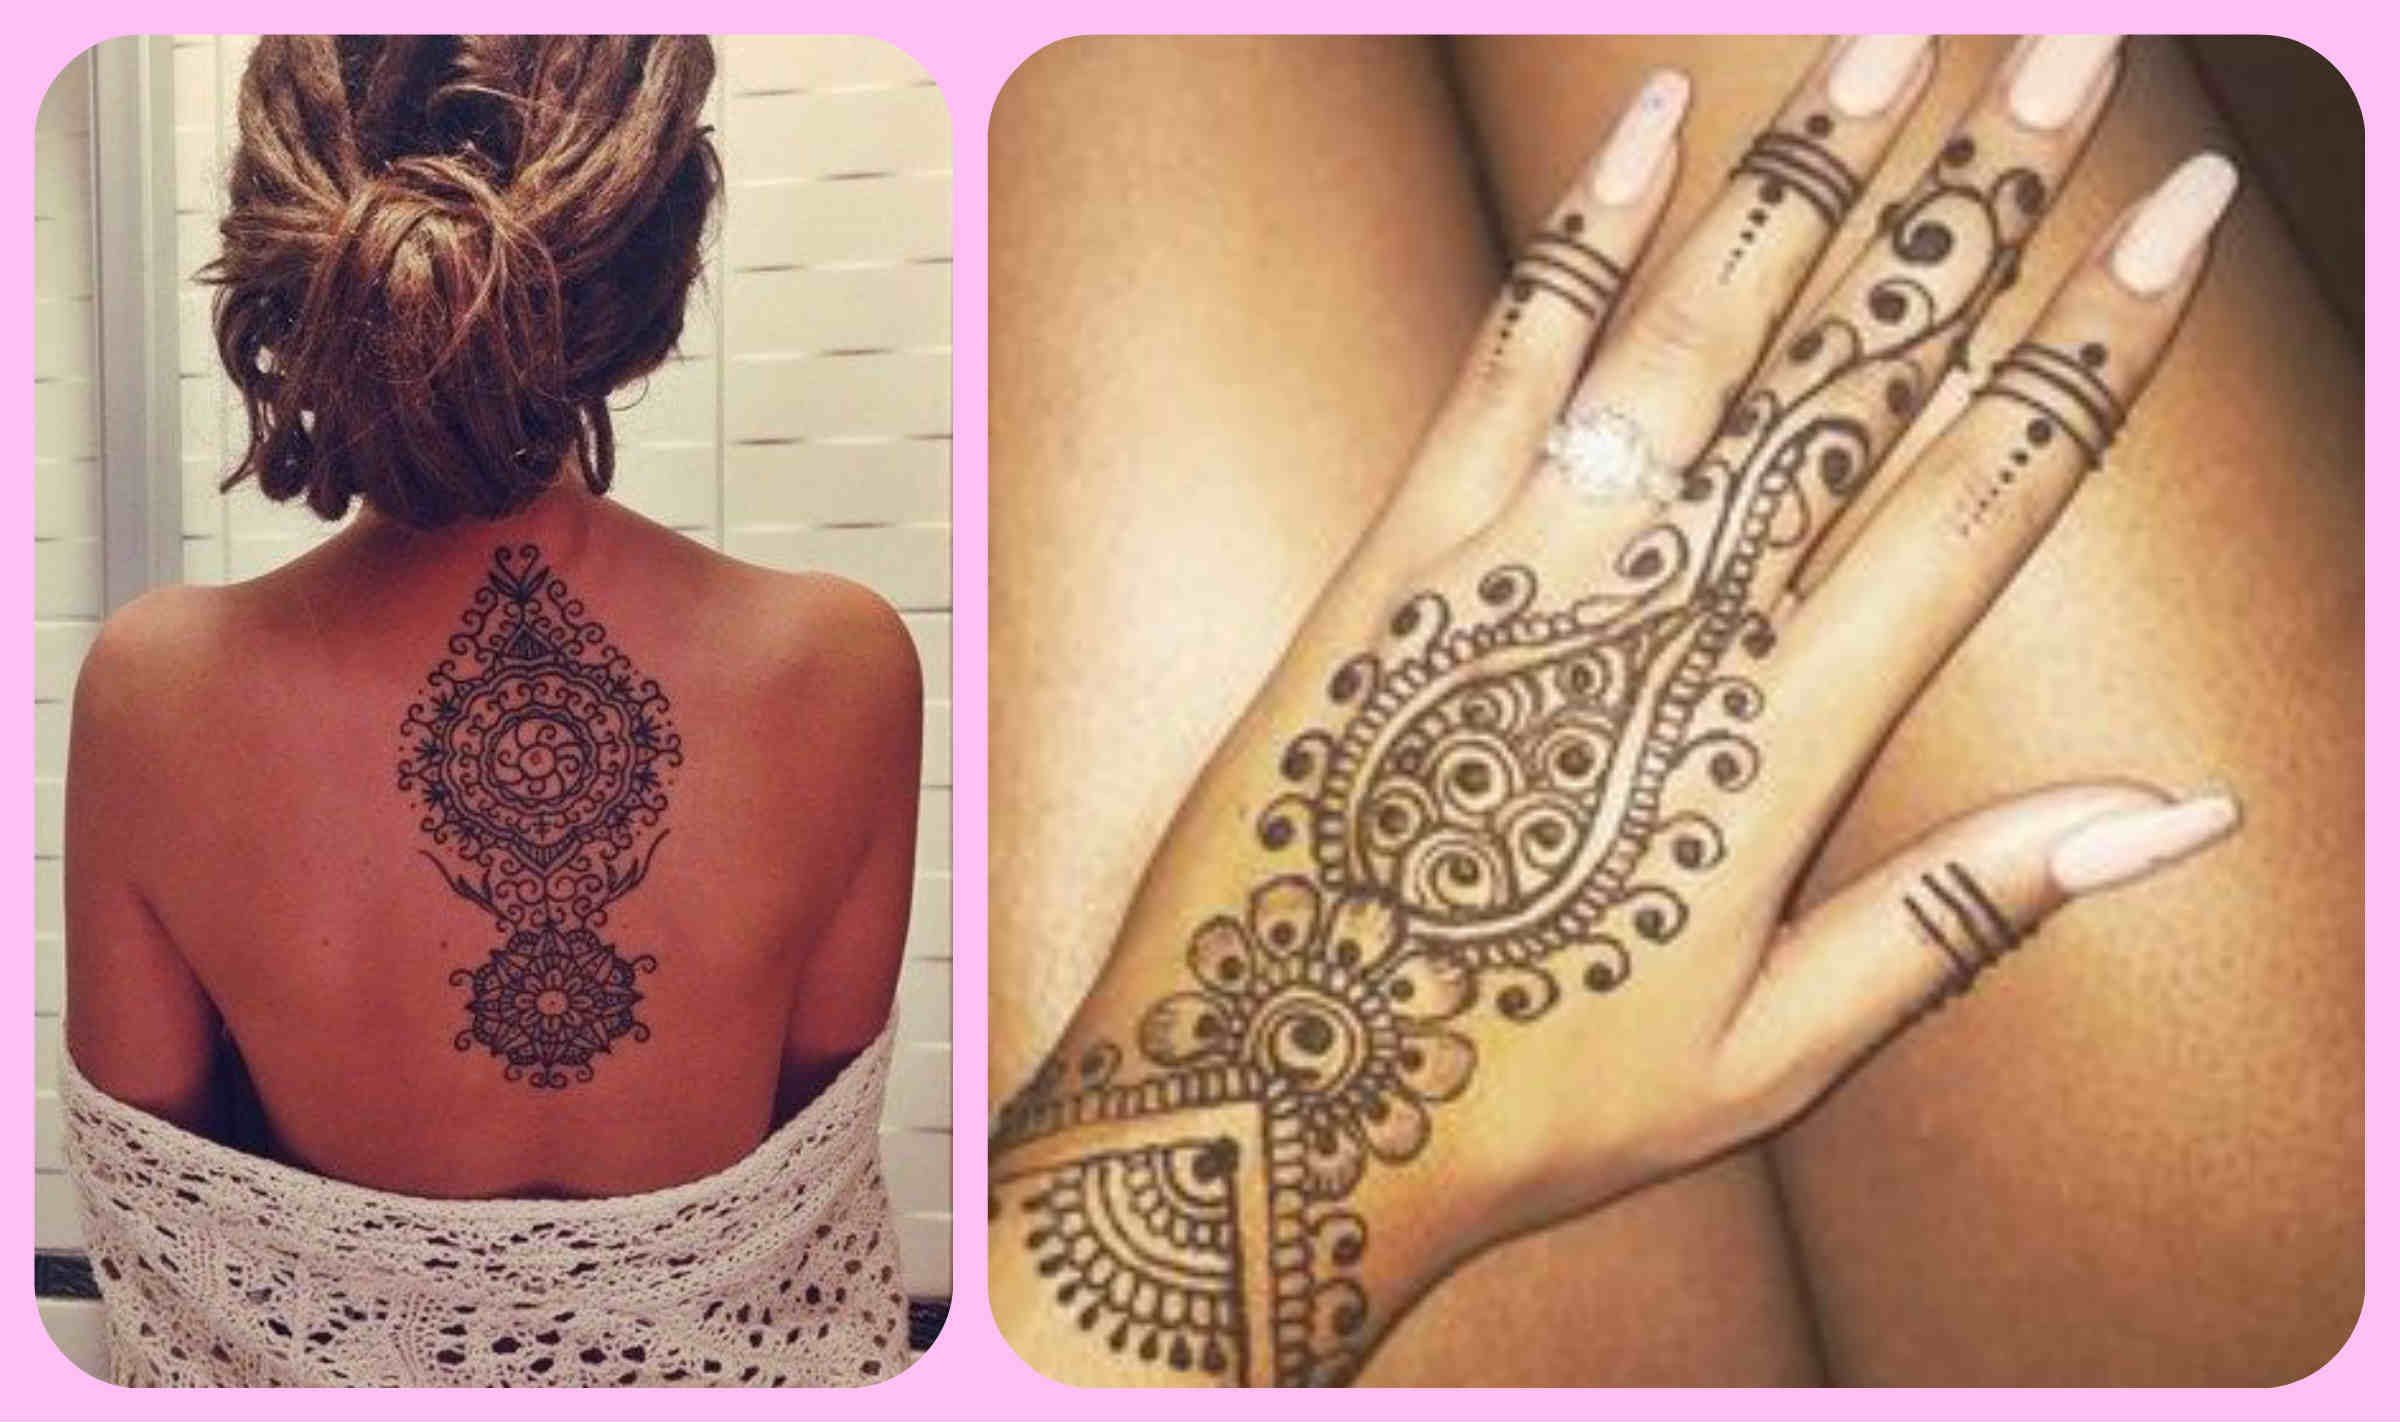 Como Hacer Tatuajes Temporales Caseros Sin Henna Hoy Os Traigo Un